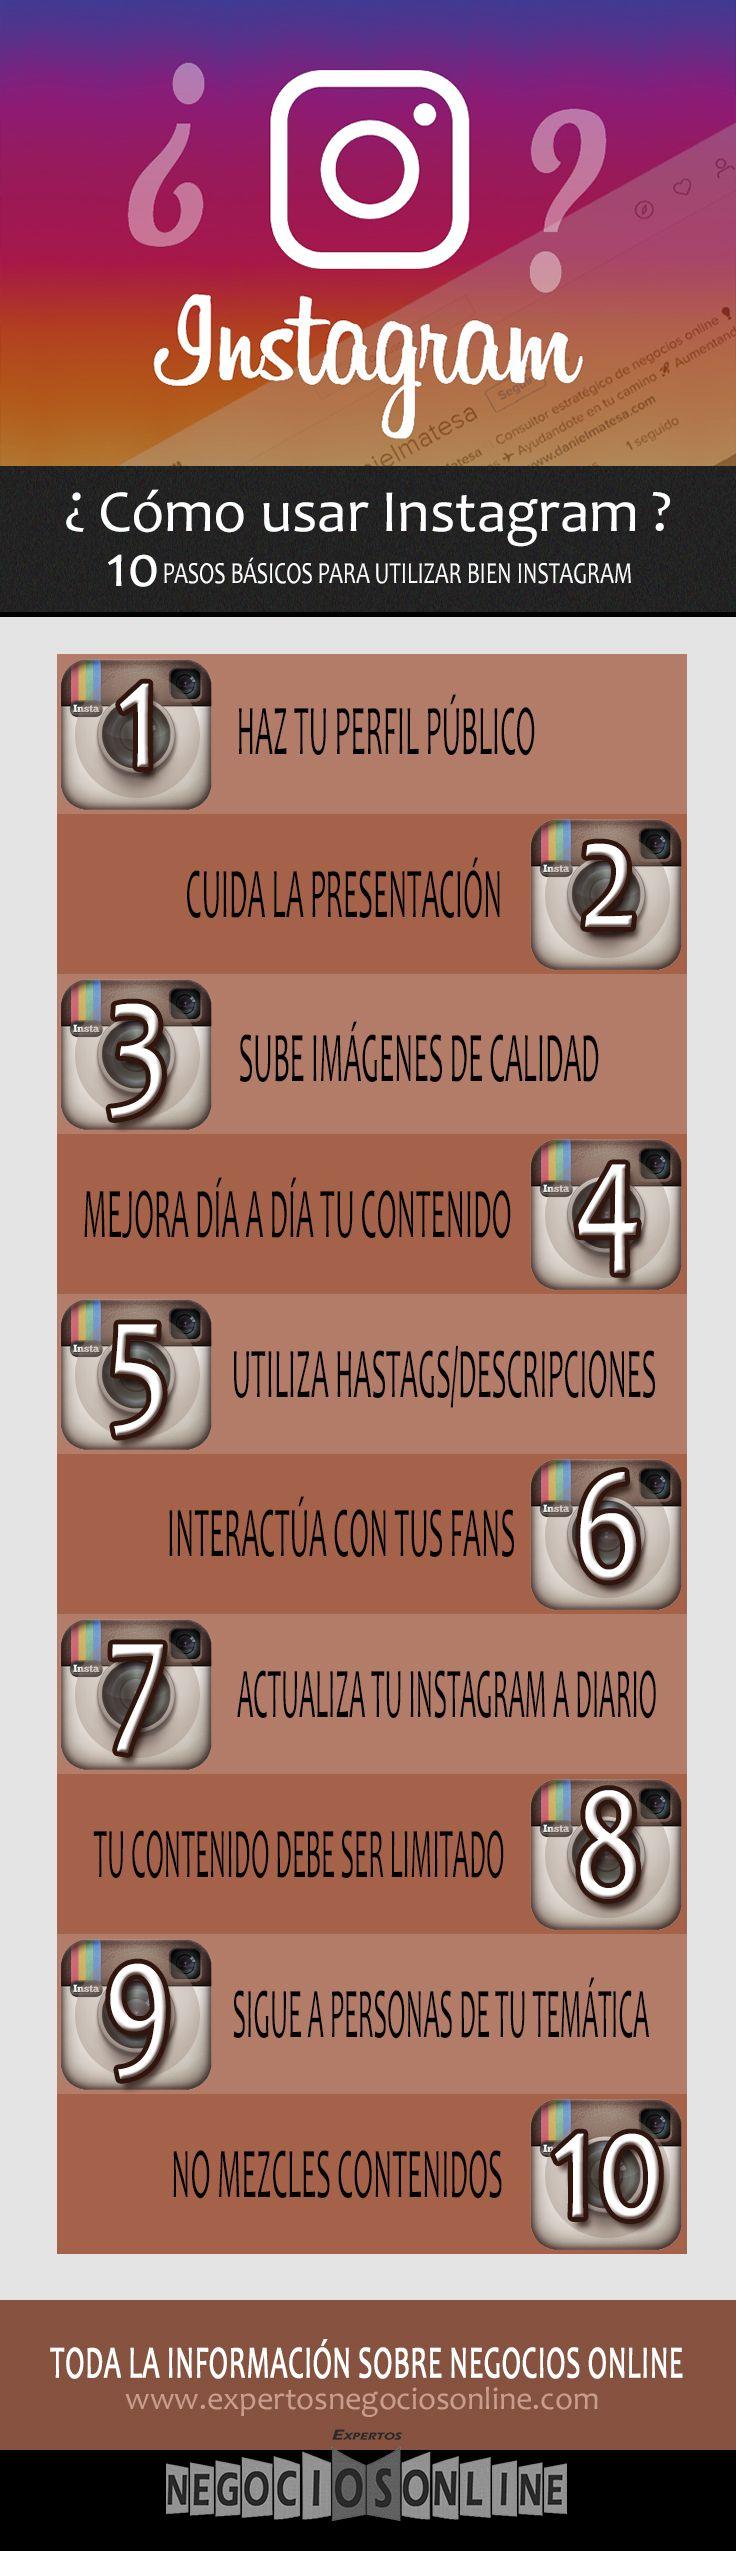 infografia de trucos sobre como usar instagram. Estrategia de redes sociales para promocionar tu pequeño negocio.